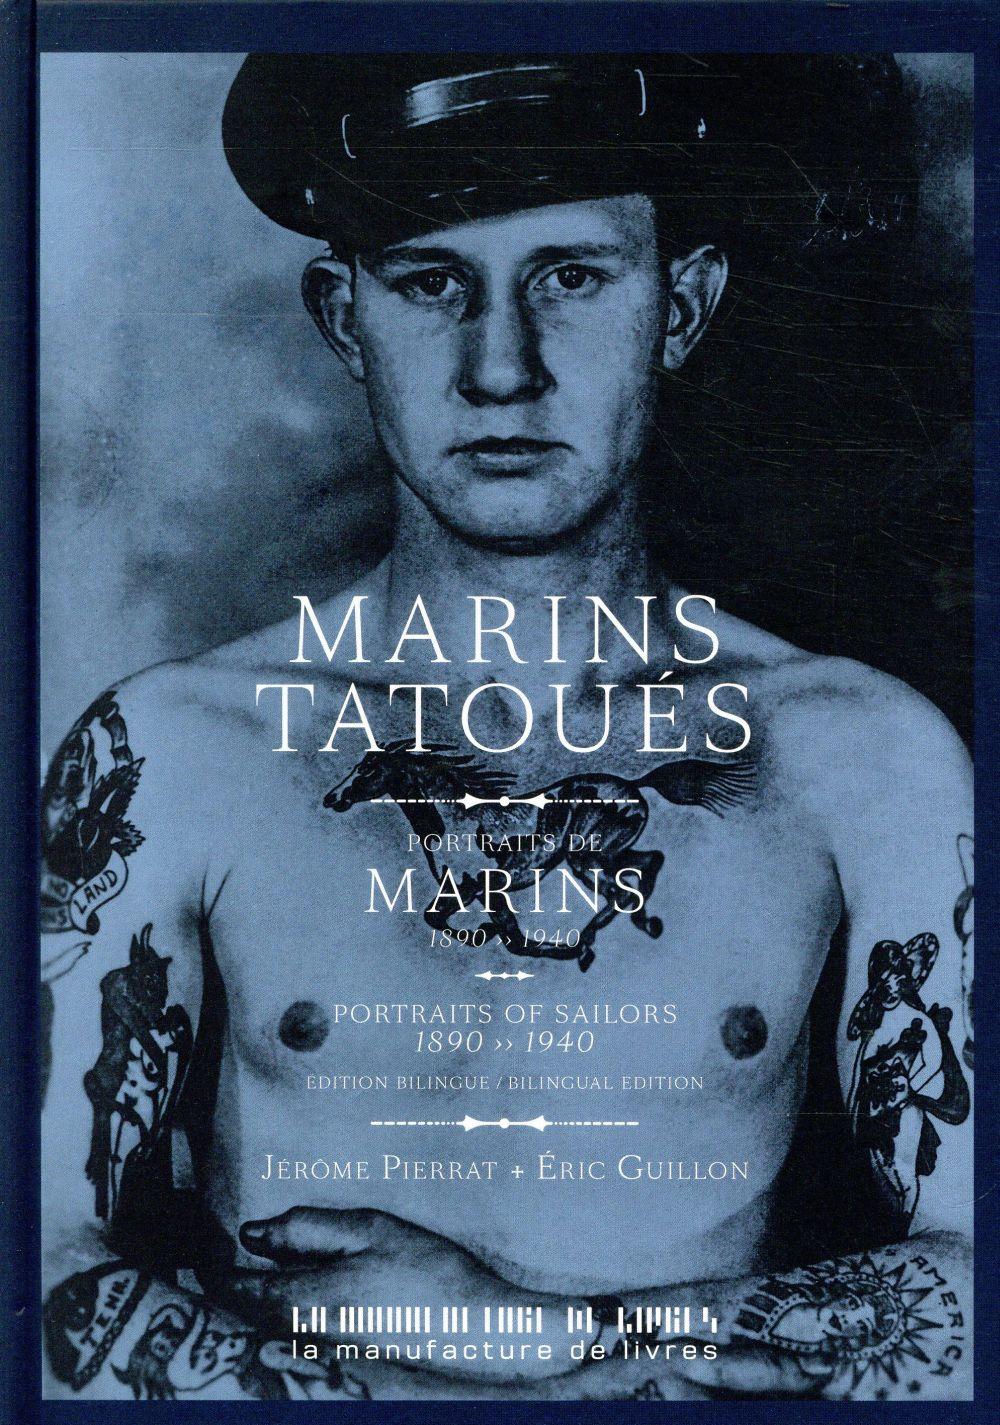 Marins tatoués